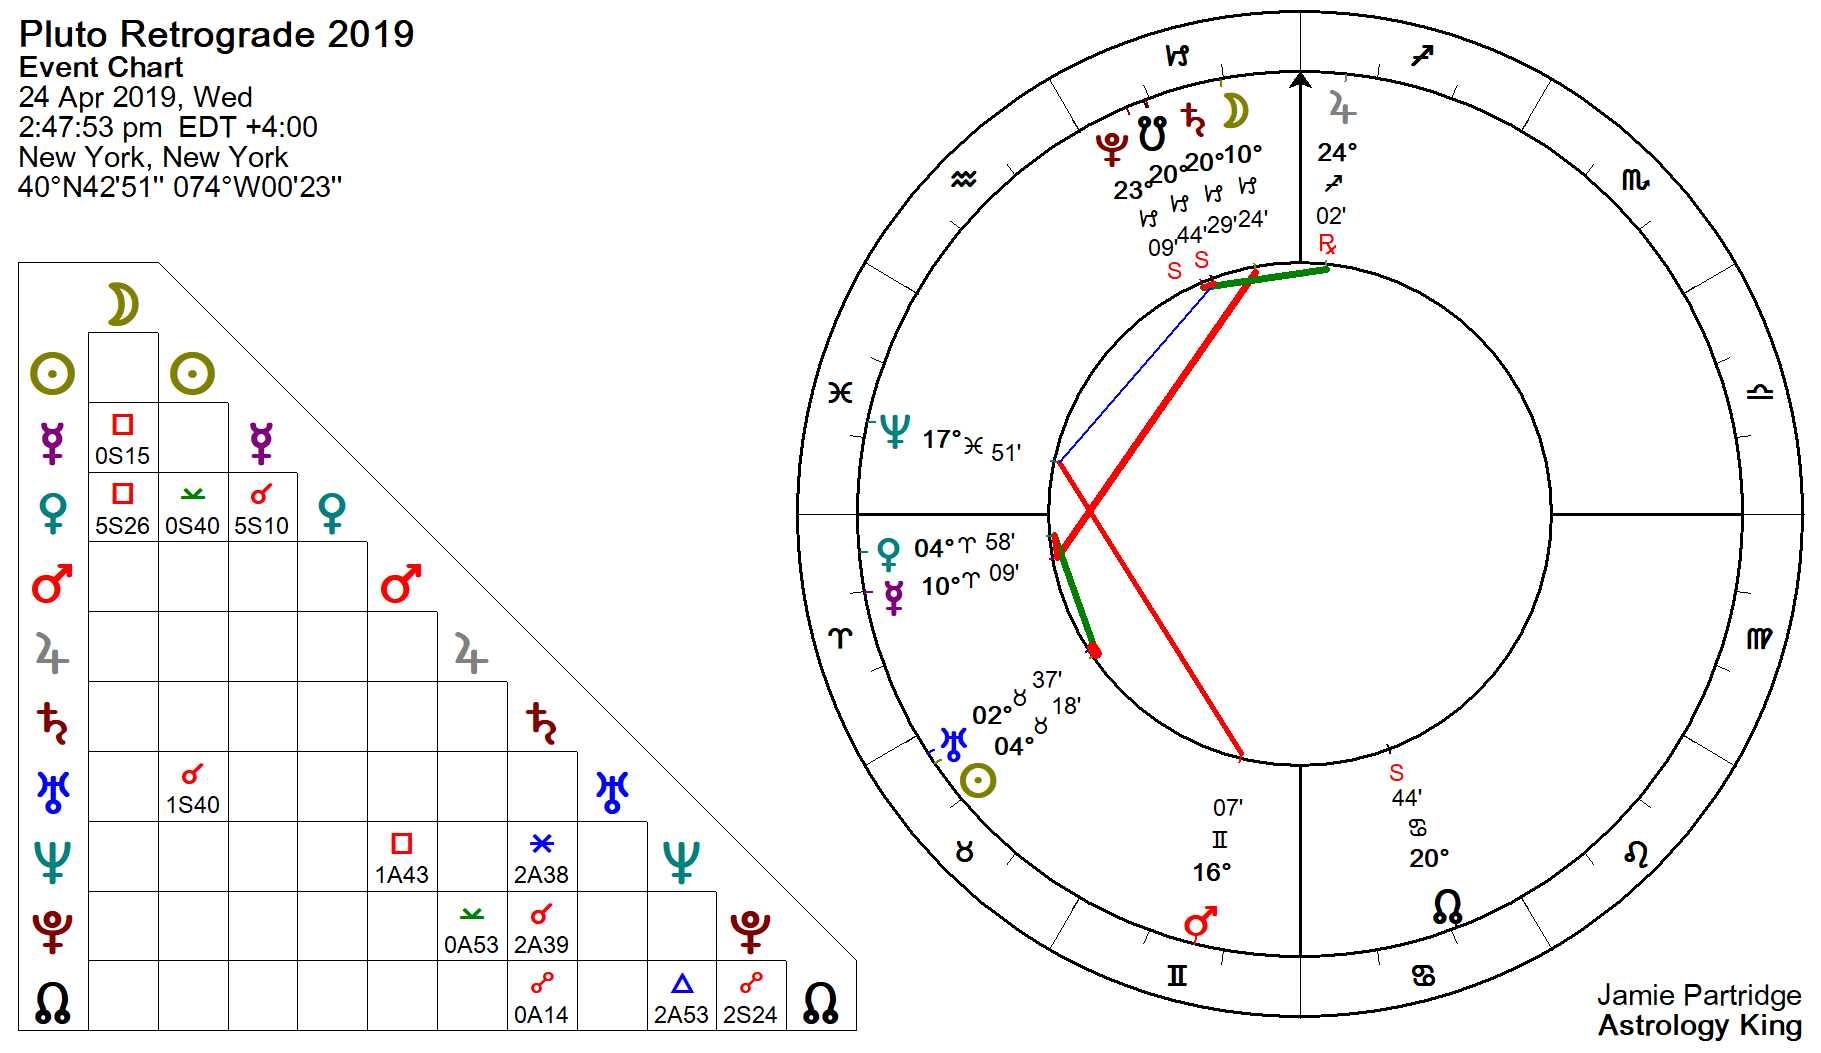 Pluto Retrograde 2019 – Serious Business – Astrology King